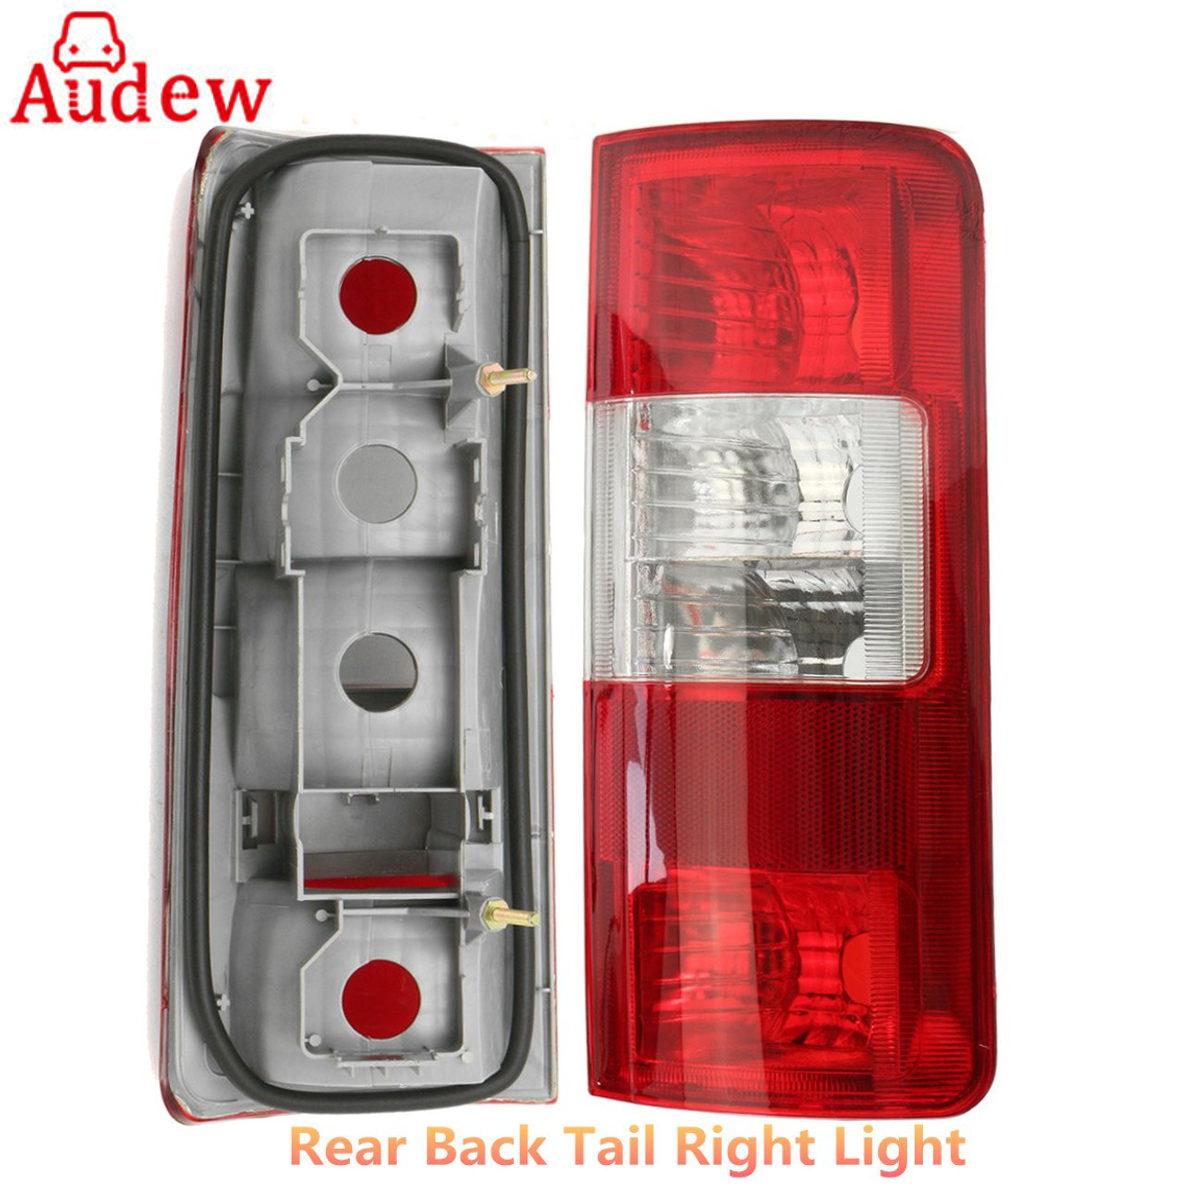 1pcs car rear backup tail lamp light lens driver left right side for ford transit